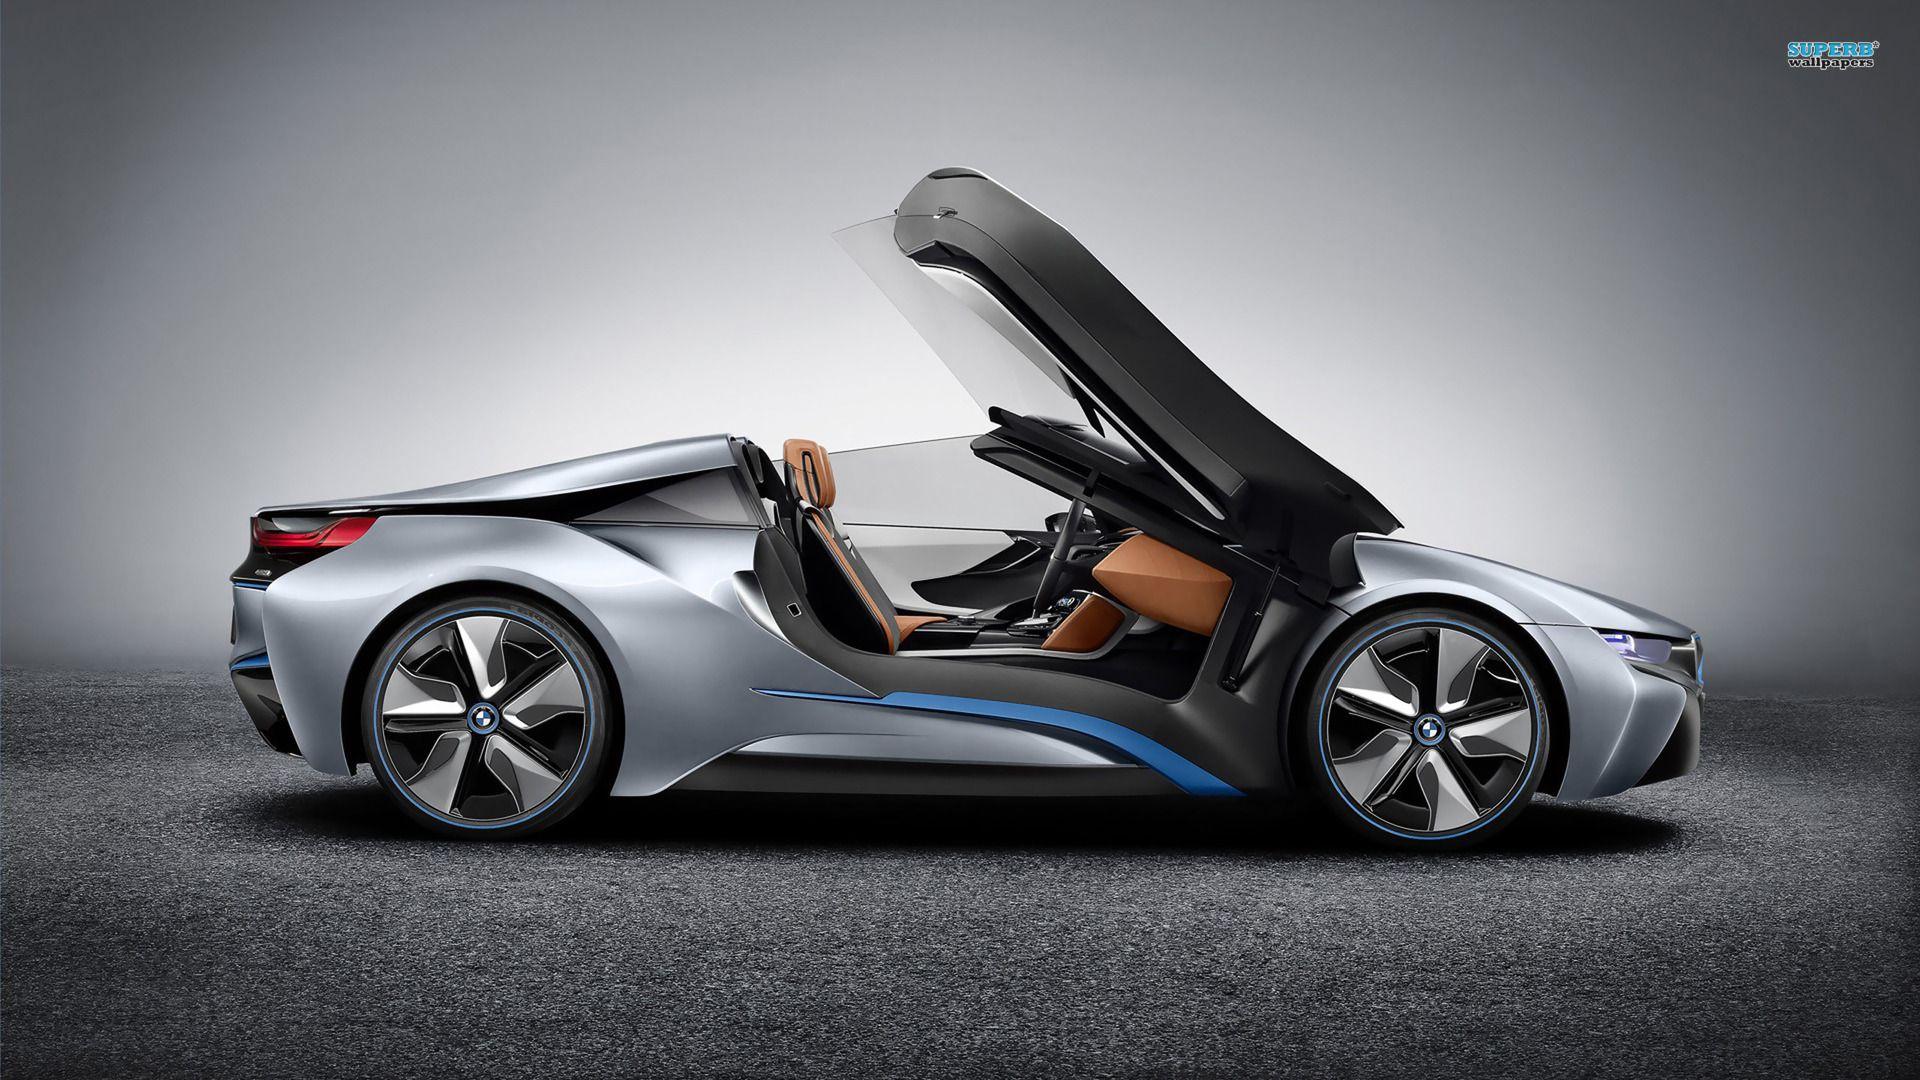 Bmw I8 Spyder Concept Car Wallpapers Http Whatstrendingonline Com Bmw I8 Spyder Concept Car Wallpapers Bmw I8 Bmw Bmw Concept Car